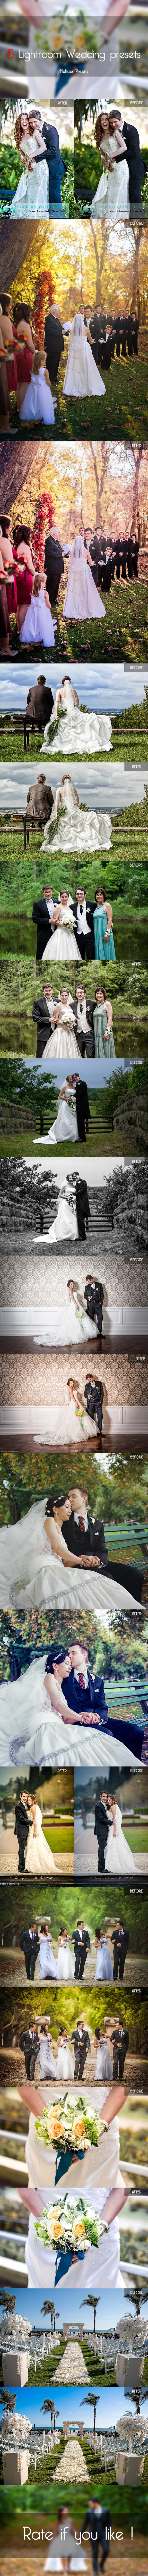 15 Wedding Lightroom Presets - Wedding Lightroom Presets